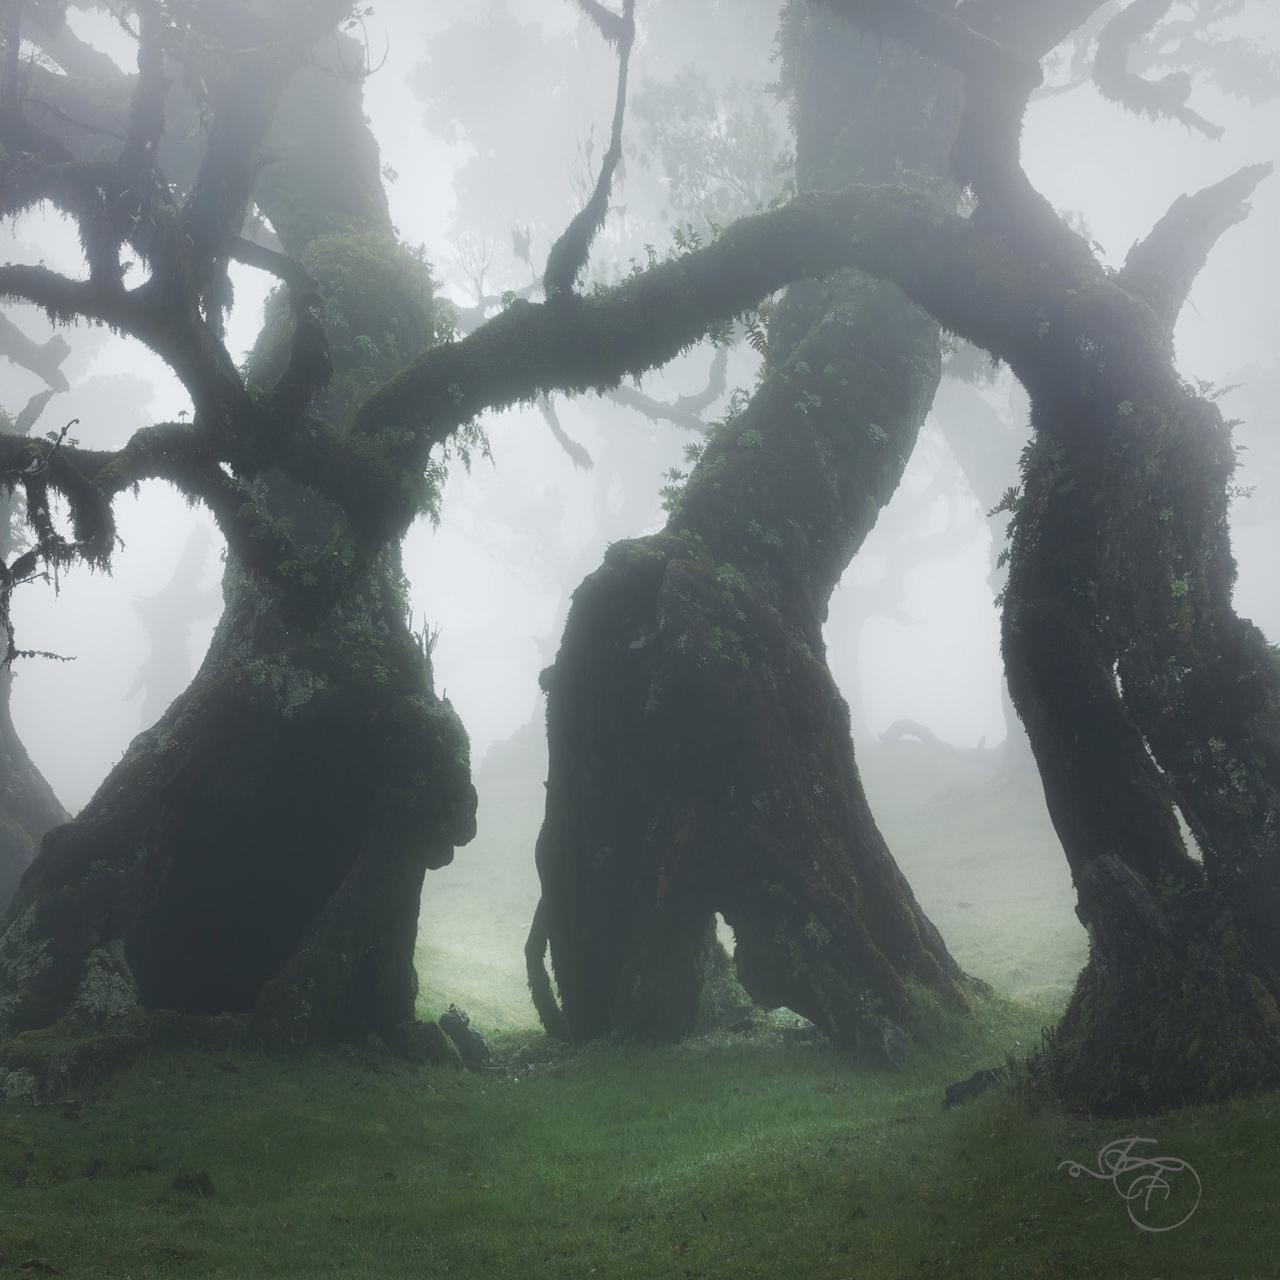 enrico-fossati-tree-photography